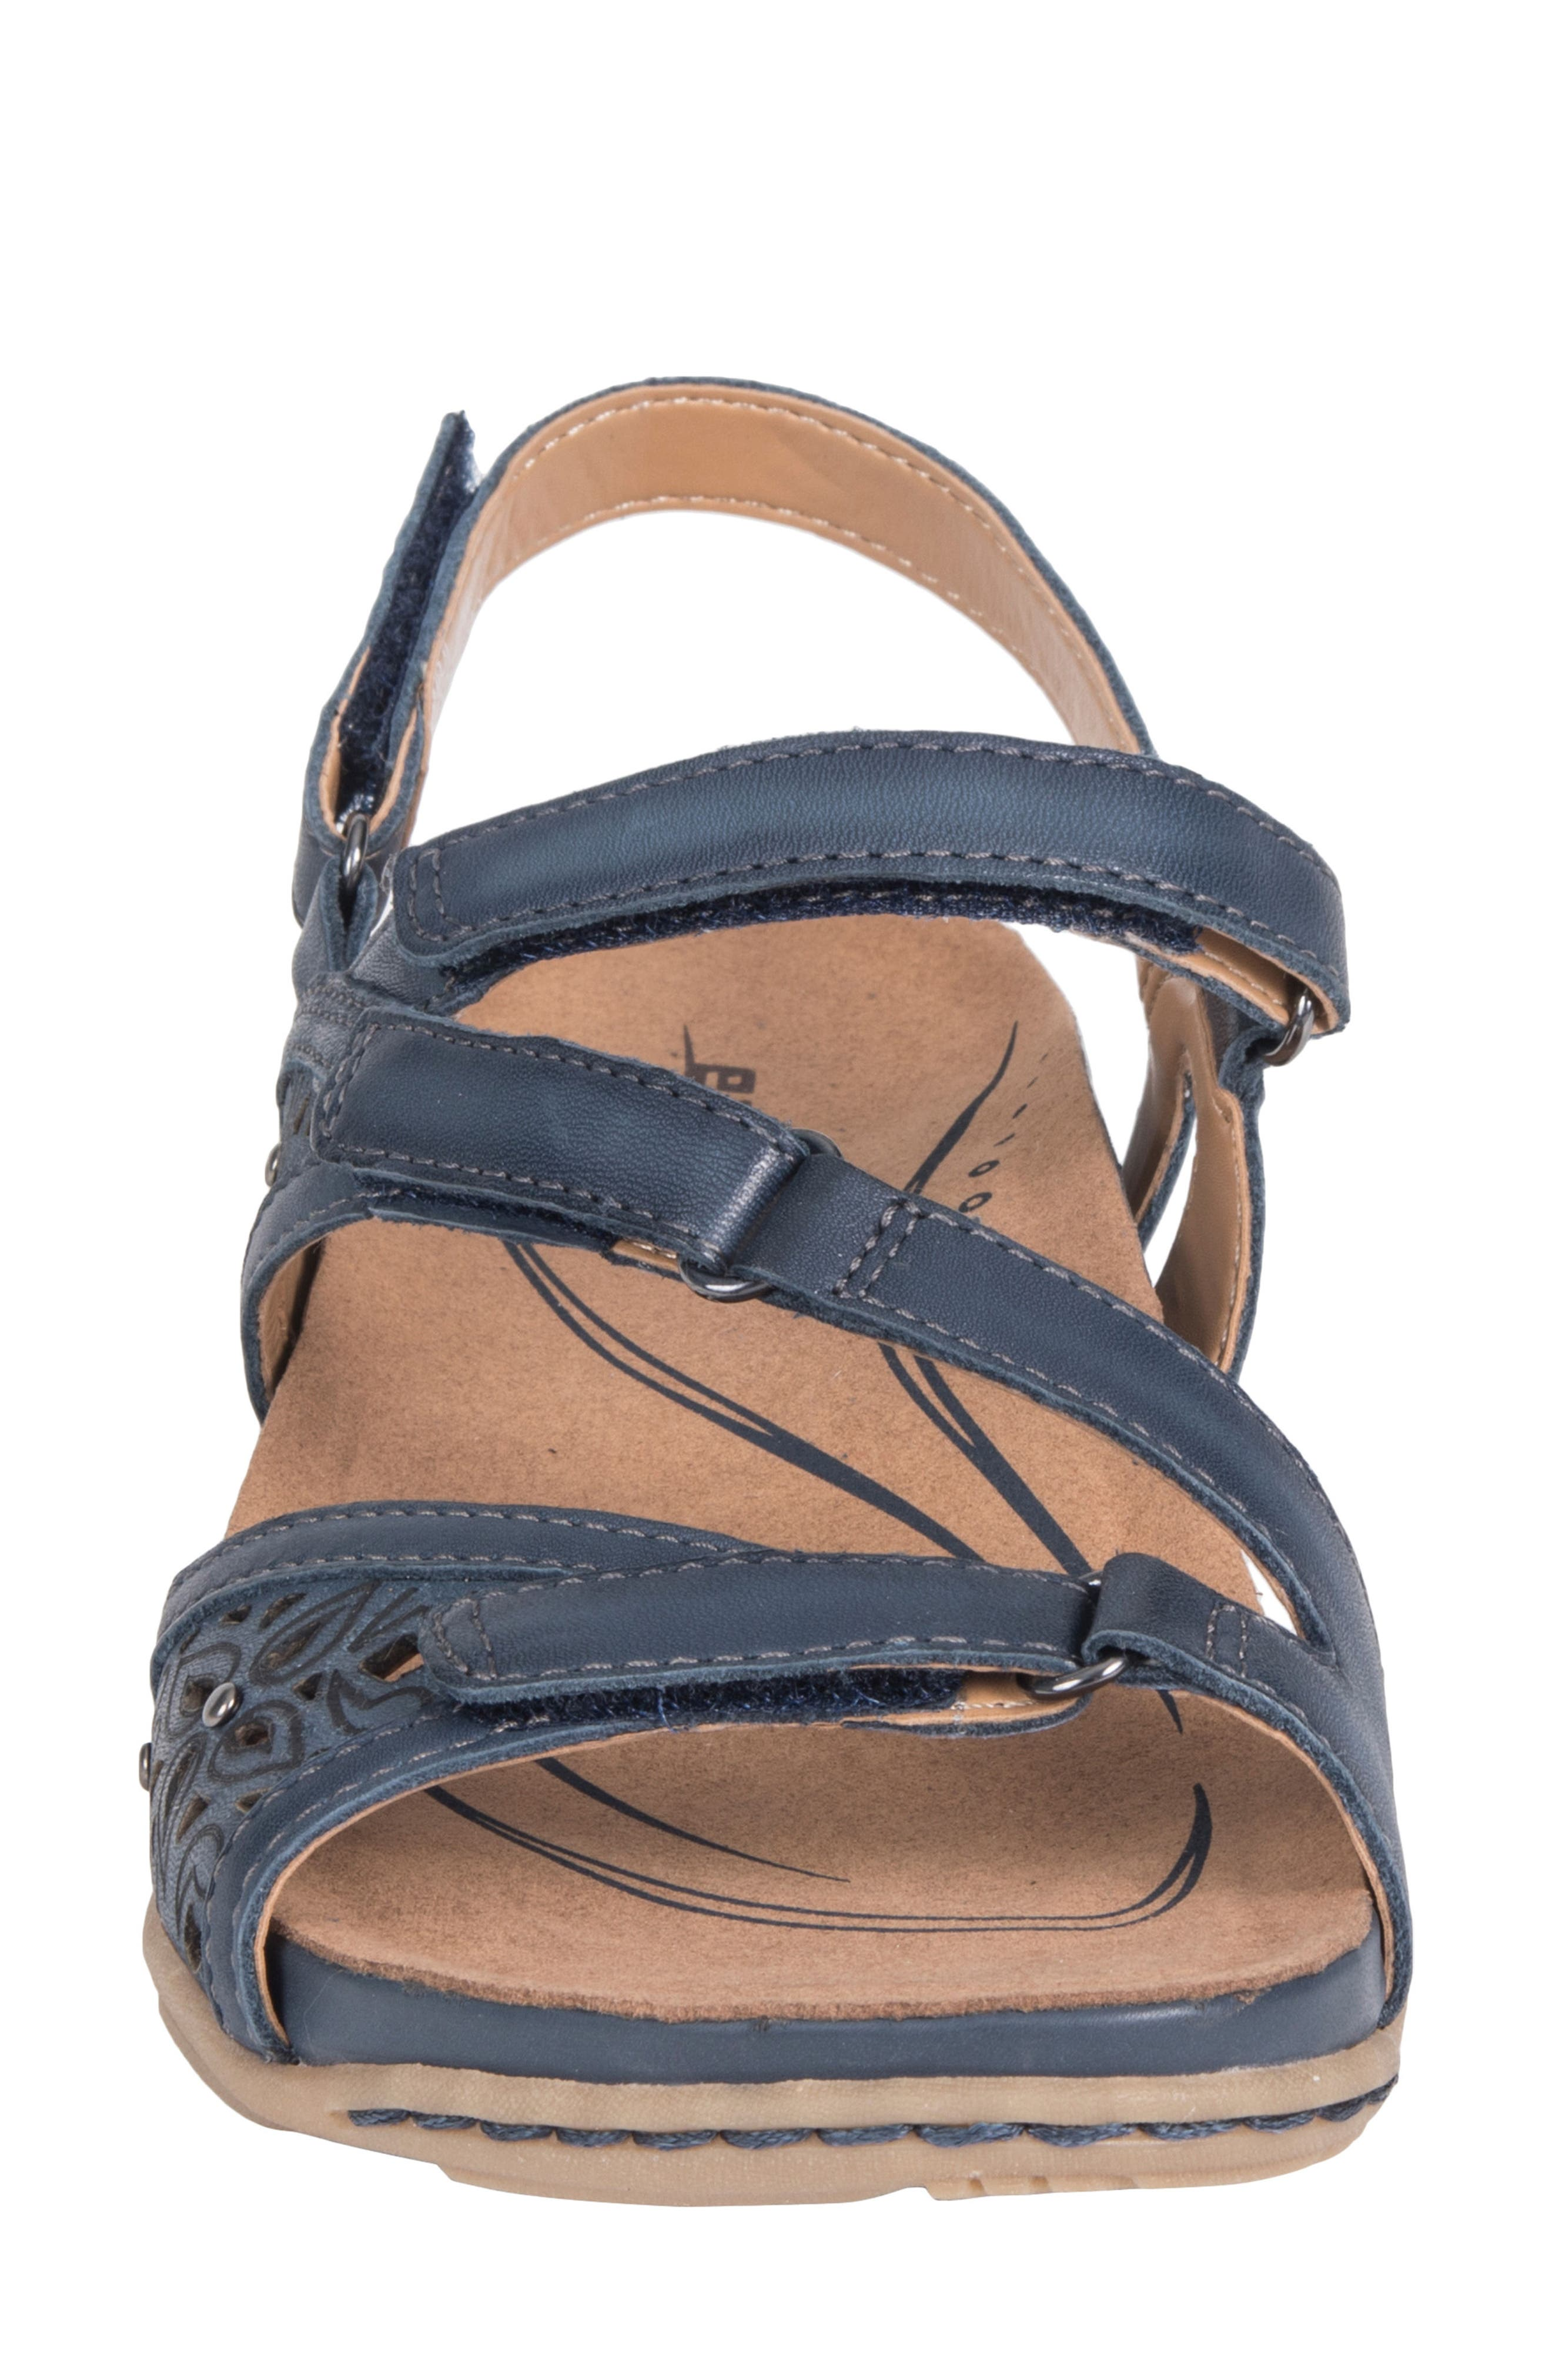 Maui Strappy Sandal,                             Alternate thumbnail 5, color,                             Indigo Blue Leather